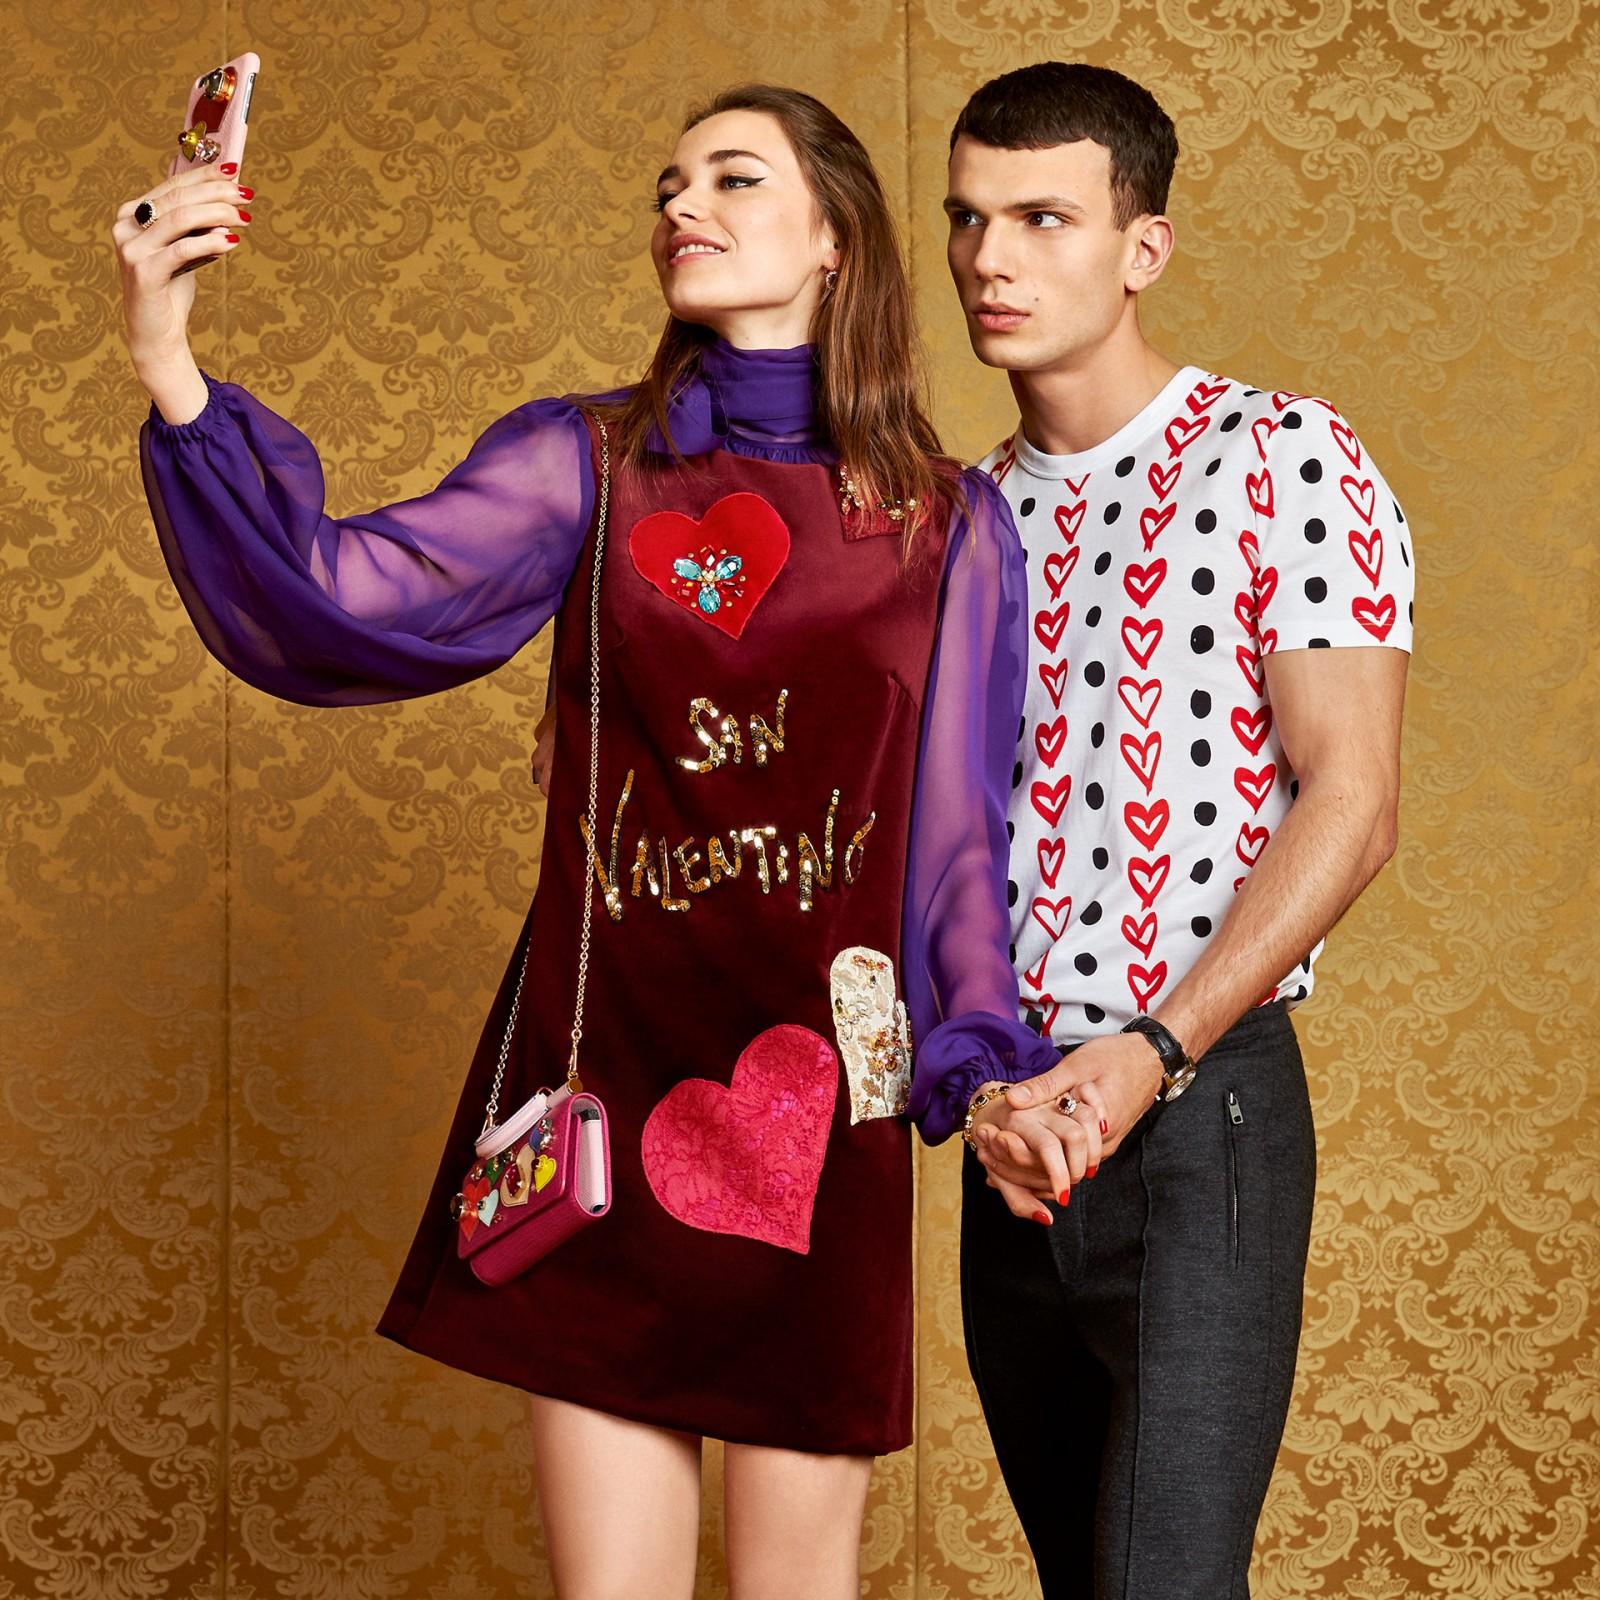 Amor & Moda: La colección San Valentín de Dolce & Gabbana